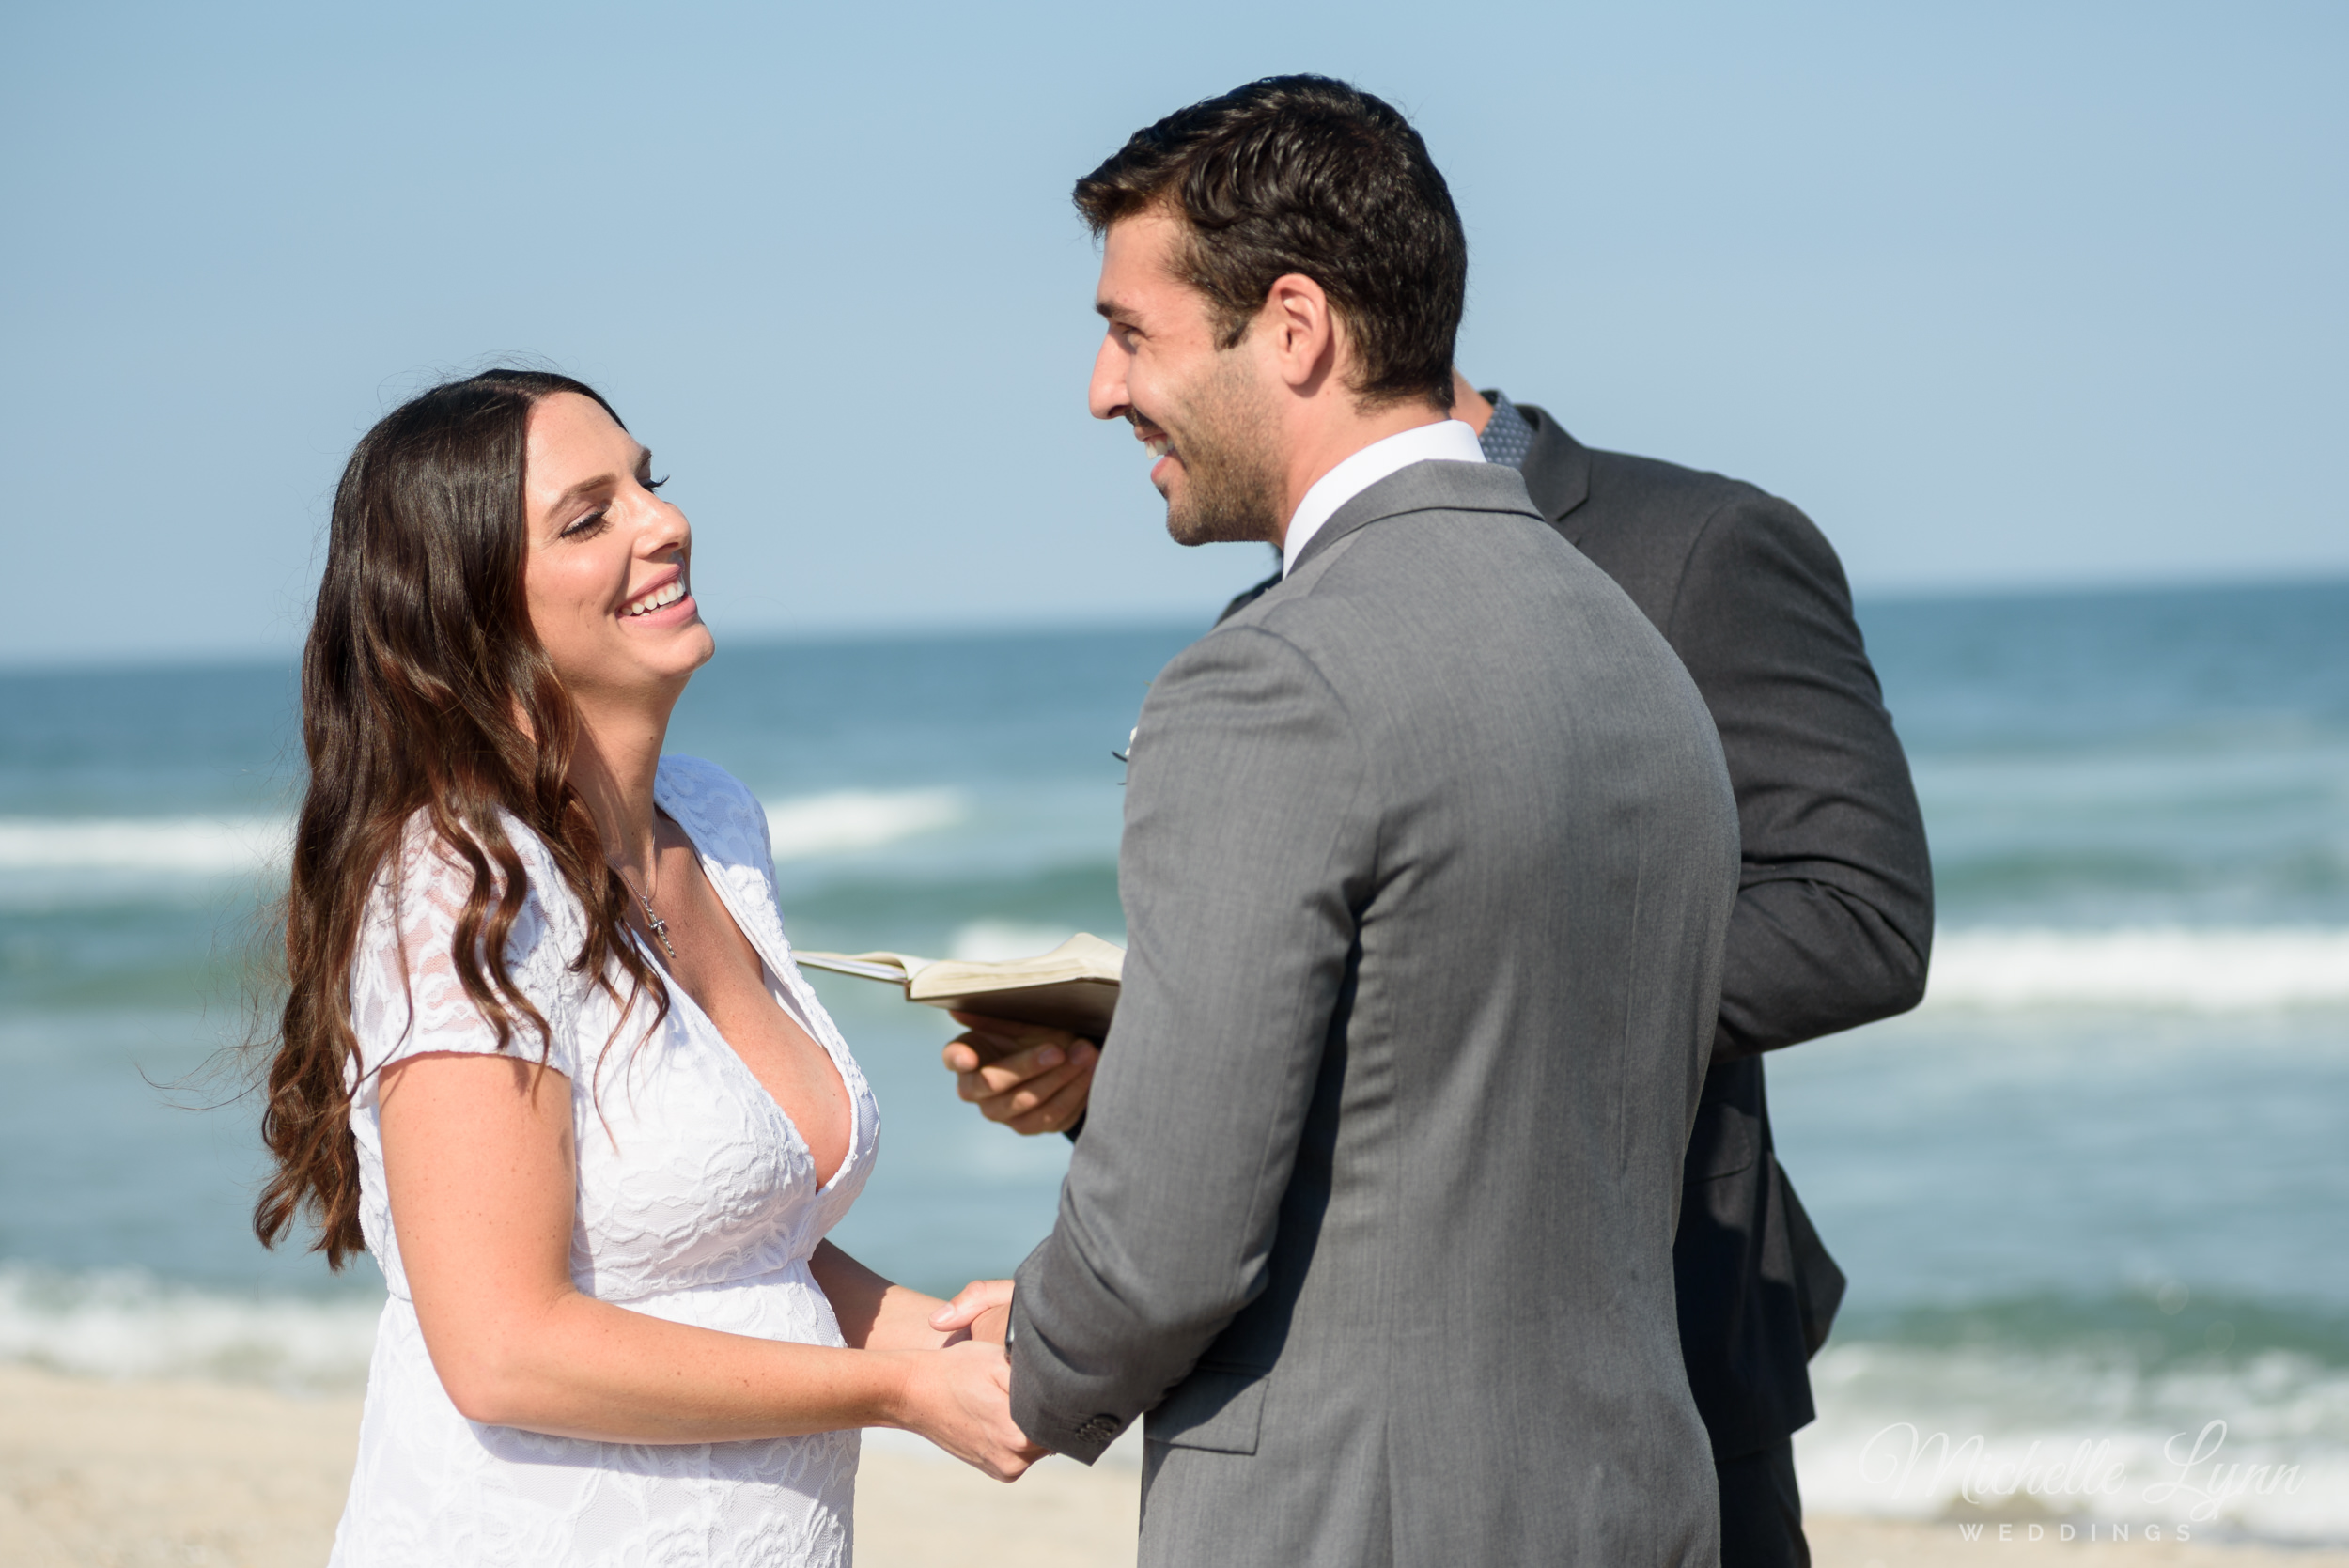 mlw-brant-beach-lbi-wedding-photography-17.jpg